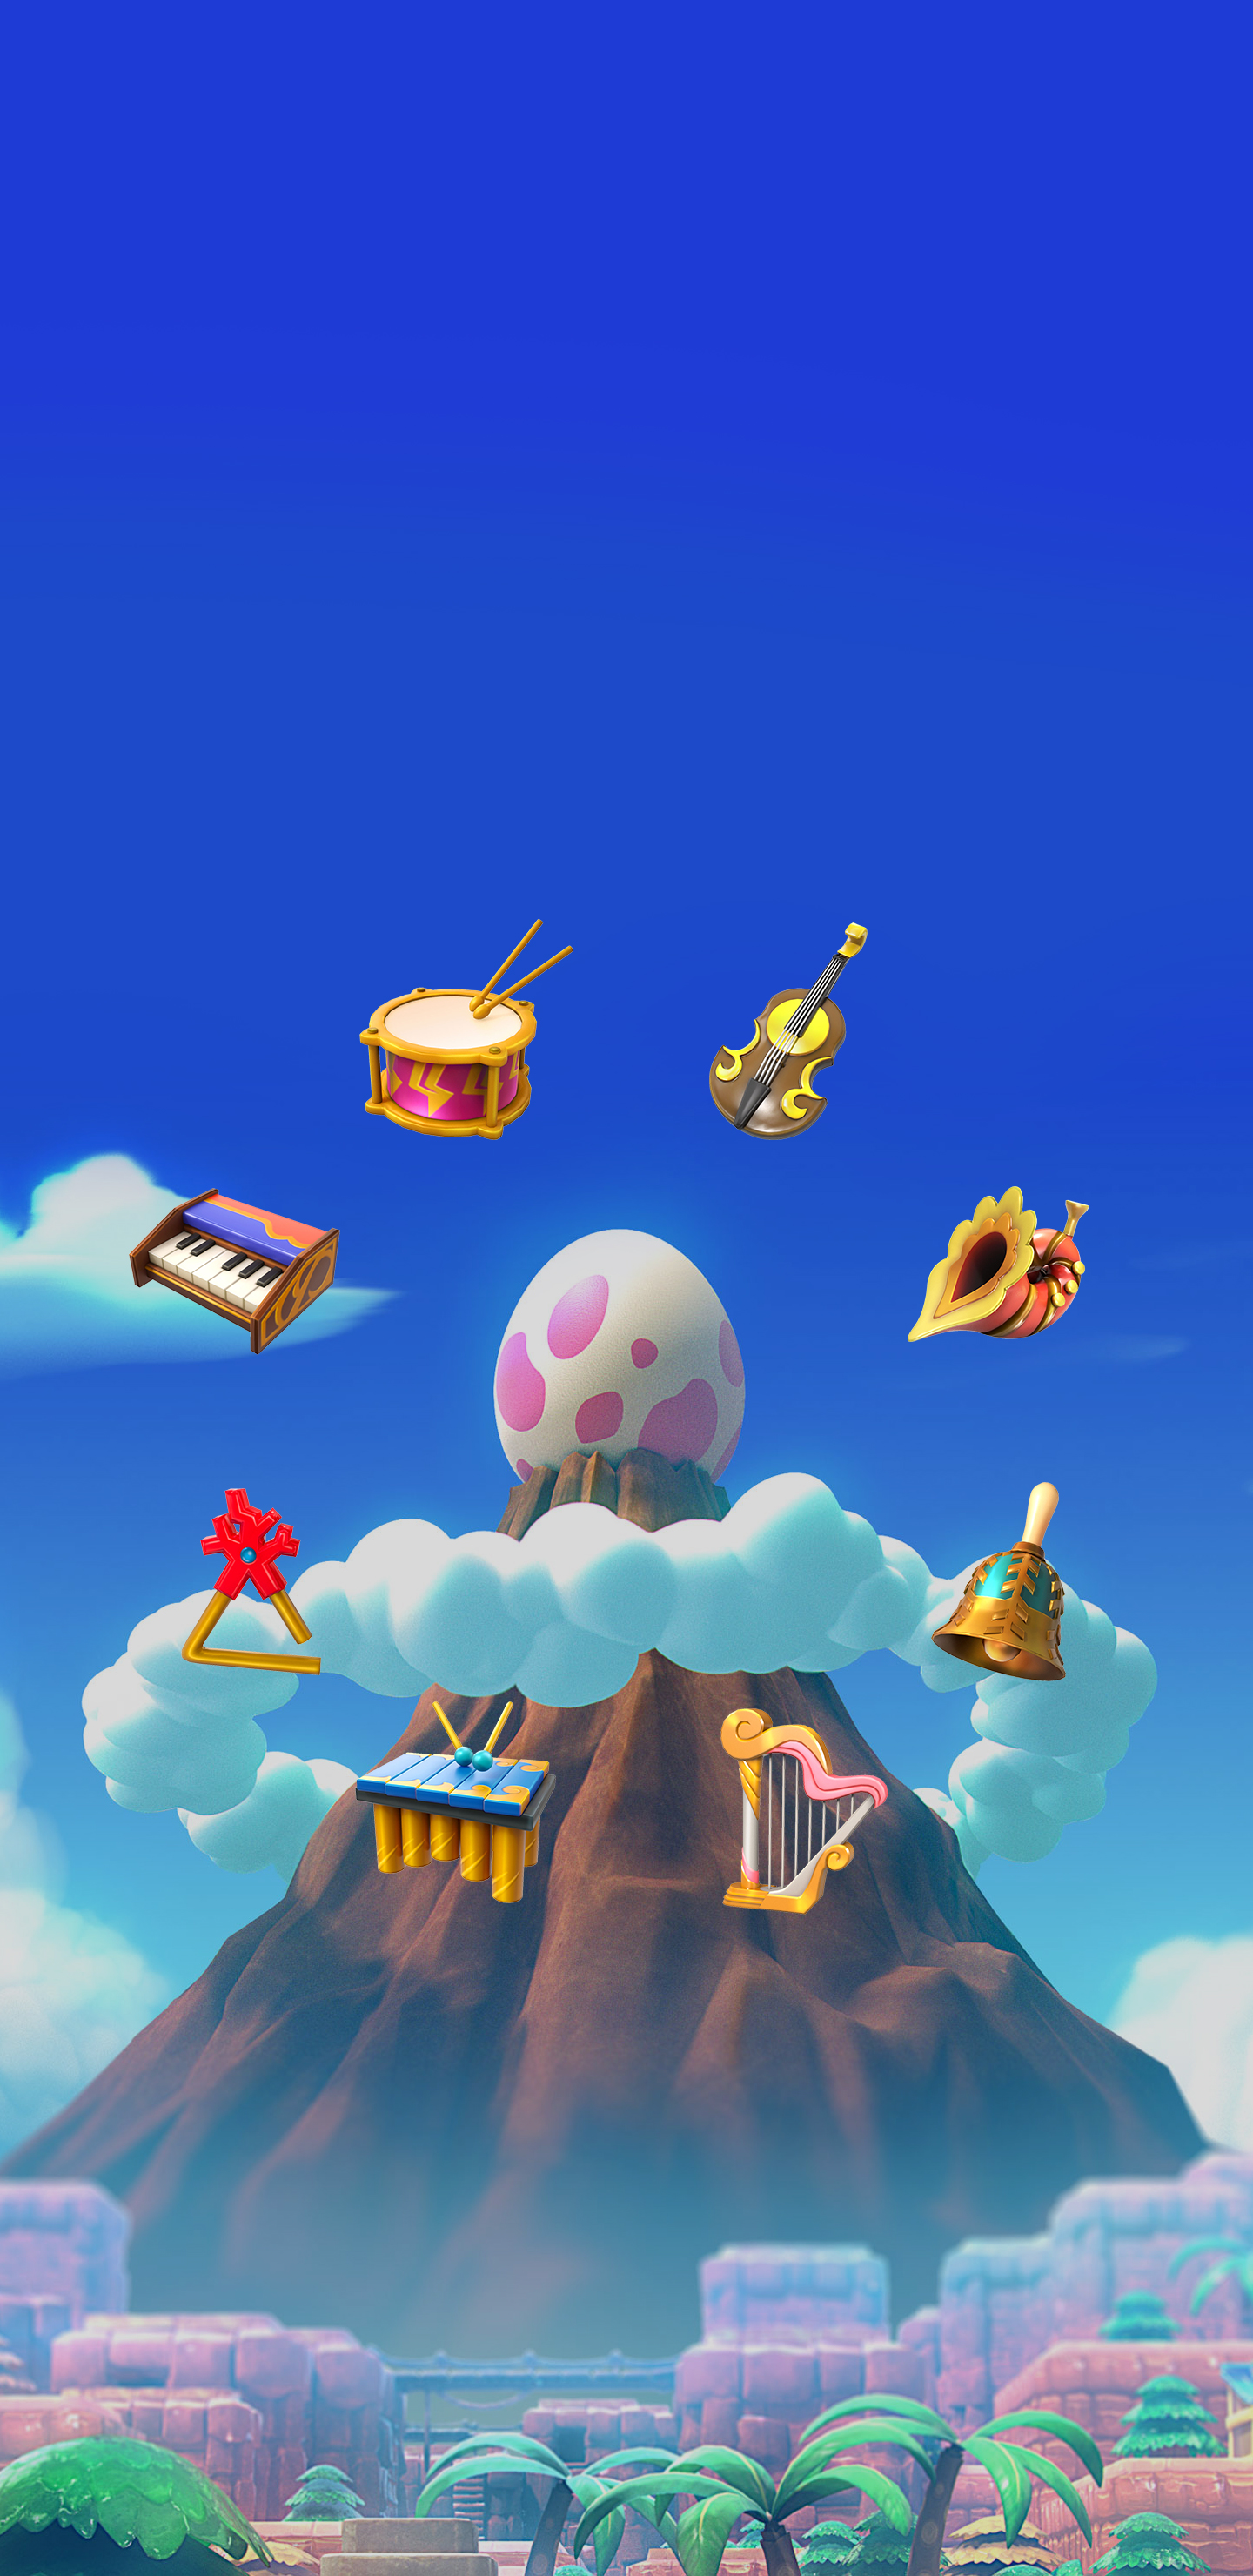 The Legend Of Zelda Link S Awakening Instruments Of The Sirens Wallpaper Cat With Monocle